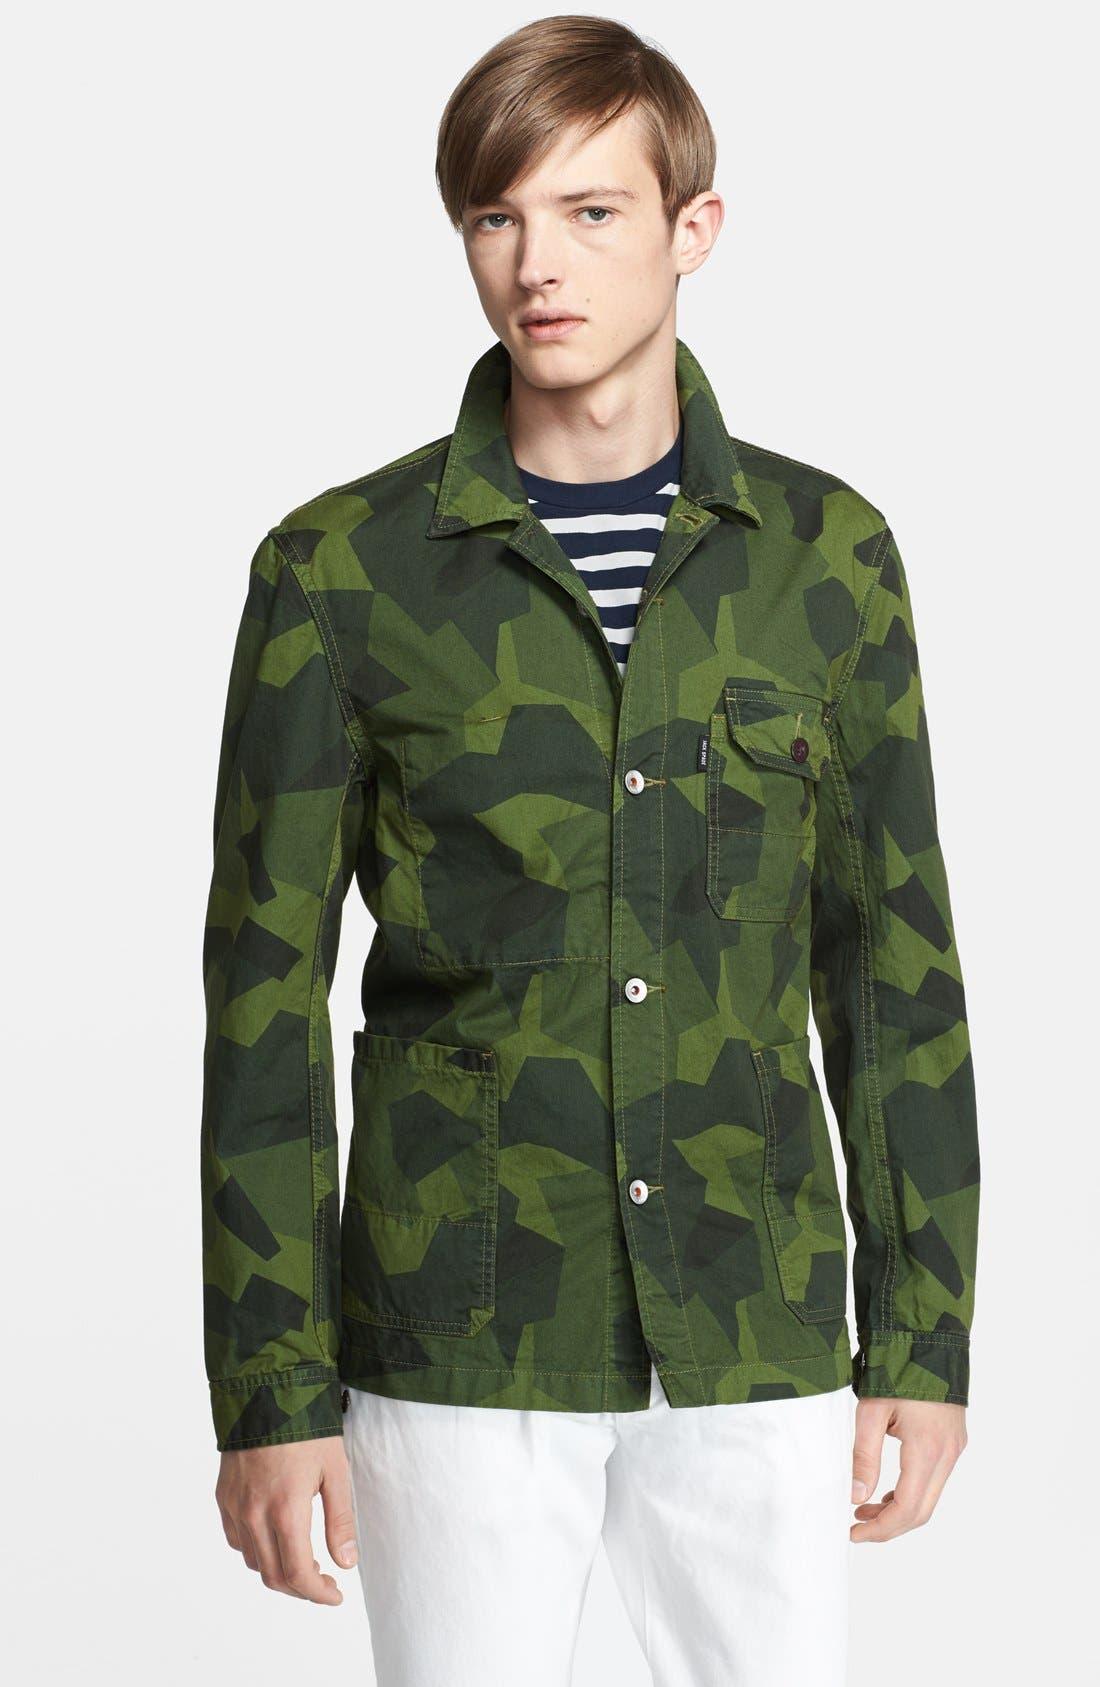 Alternate Image 1 Selected - Jack Spade 'Buckner' Camo Short Jacket